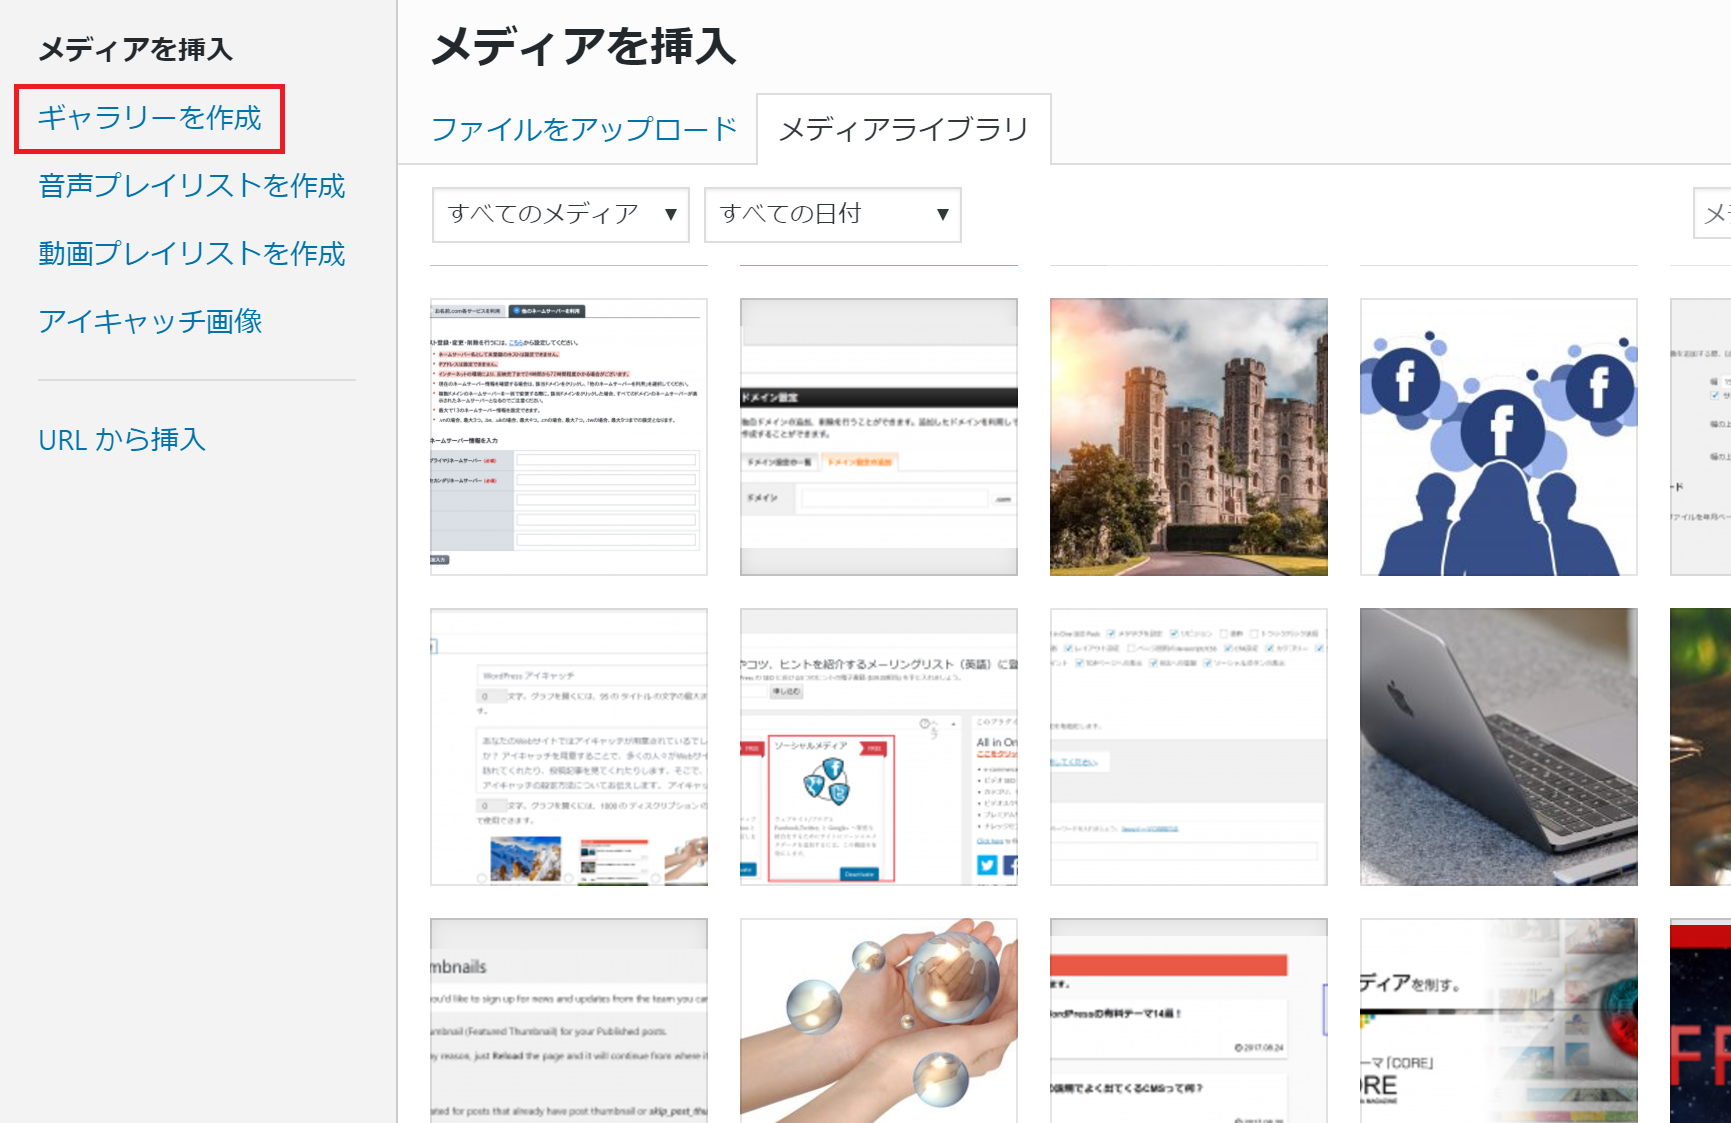 gallery - WordPressのギャラリー機能とは?関連プラグイン12選(日本語対応あり)